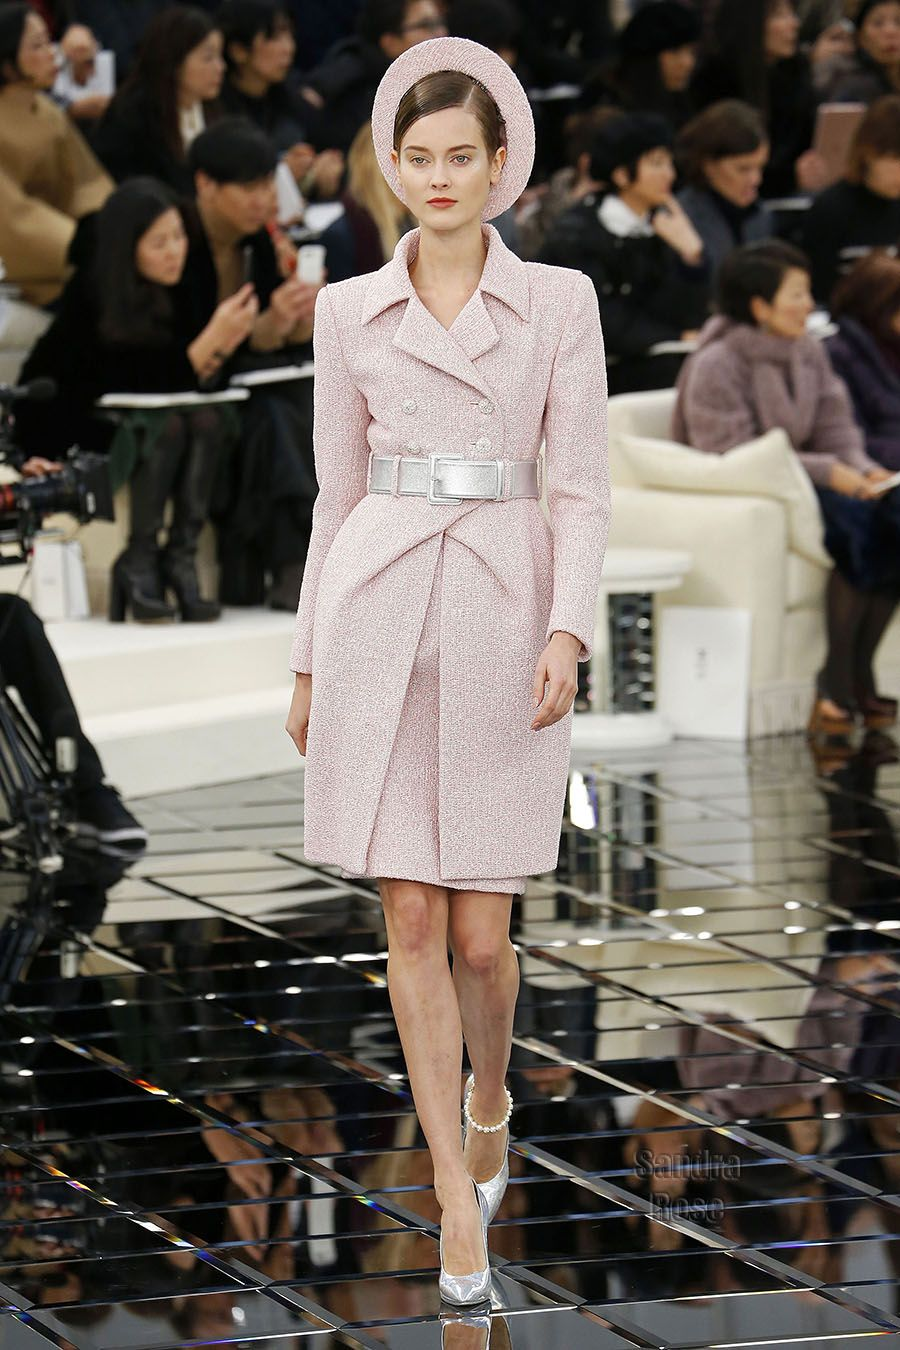 663154d676c Paris Fashion Week Haute Couture Spring Summer 2017 – Chanel – Catwalk  Featuring  Model